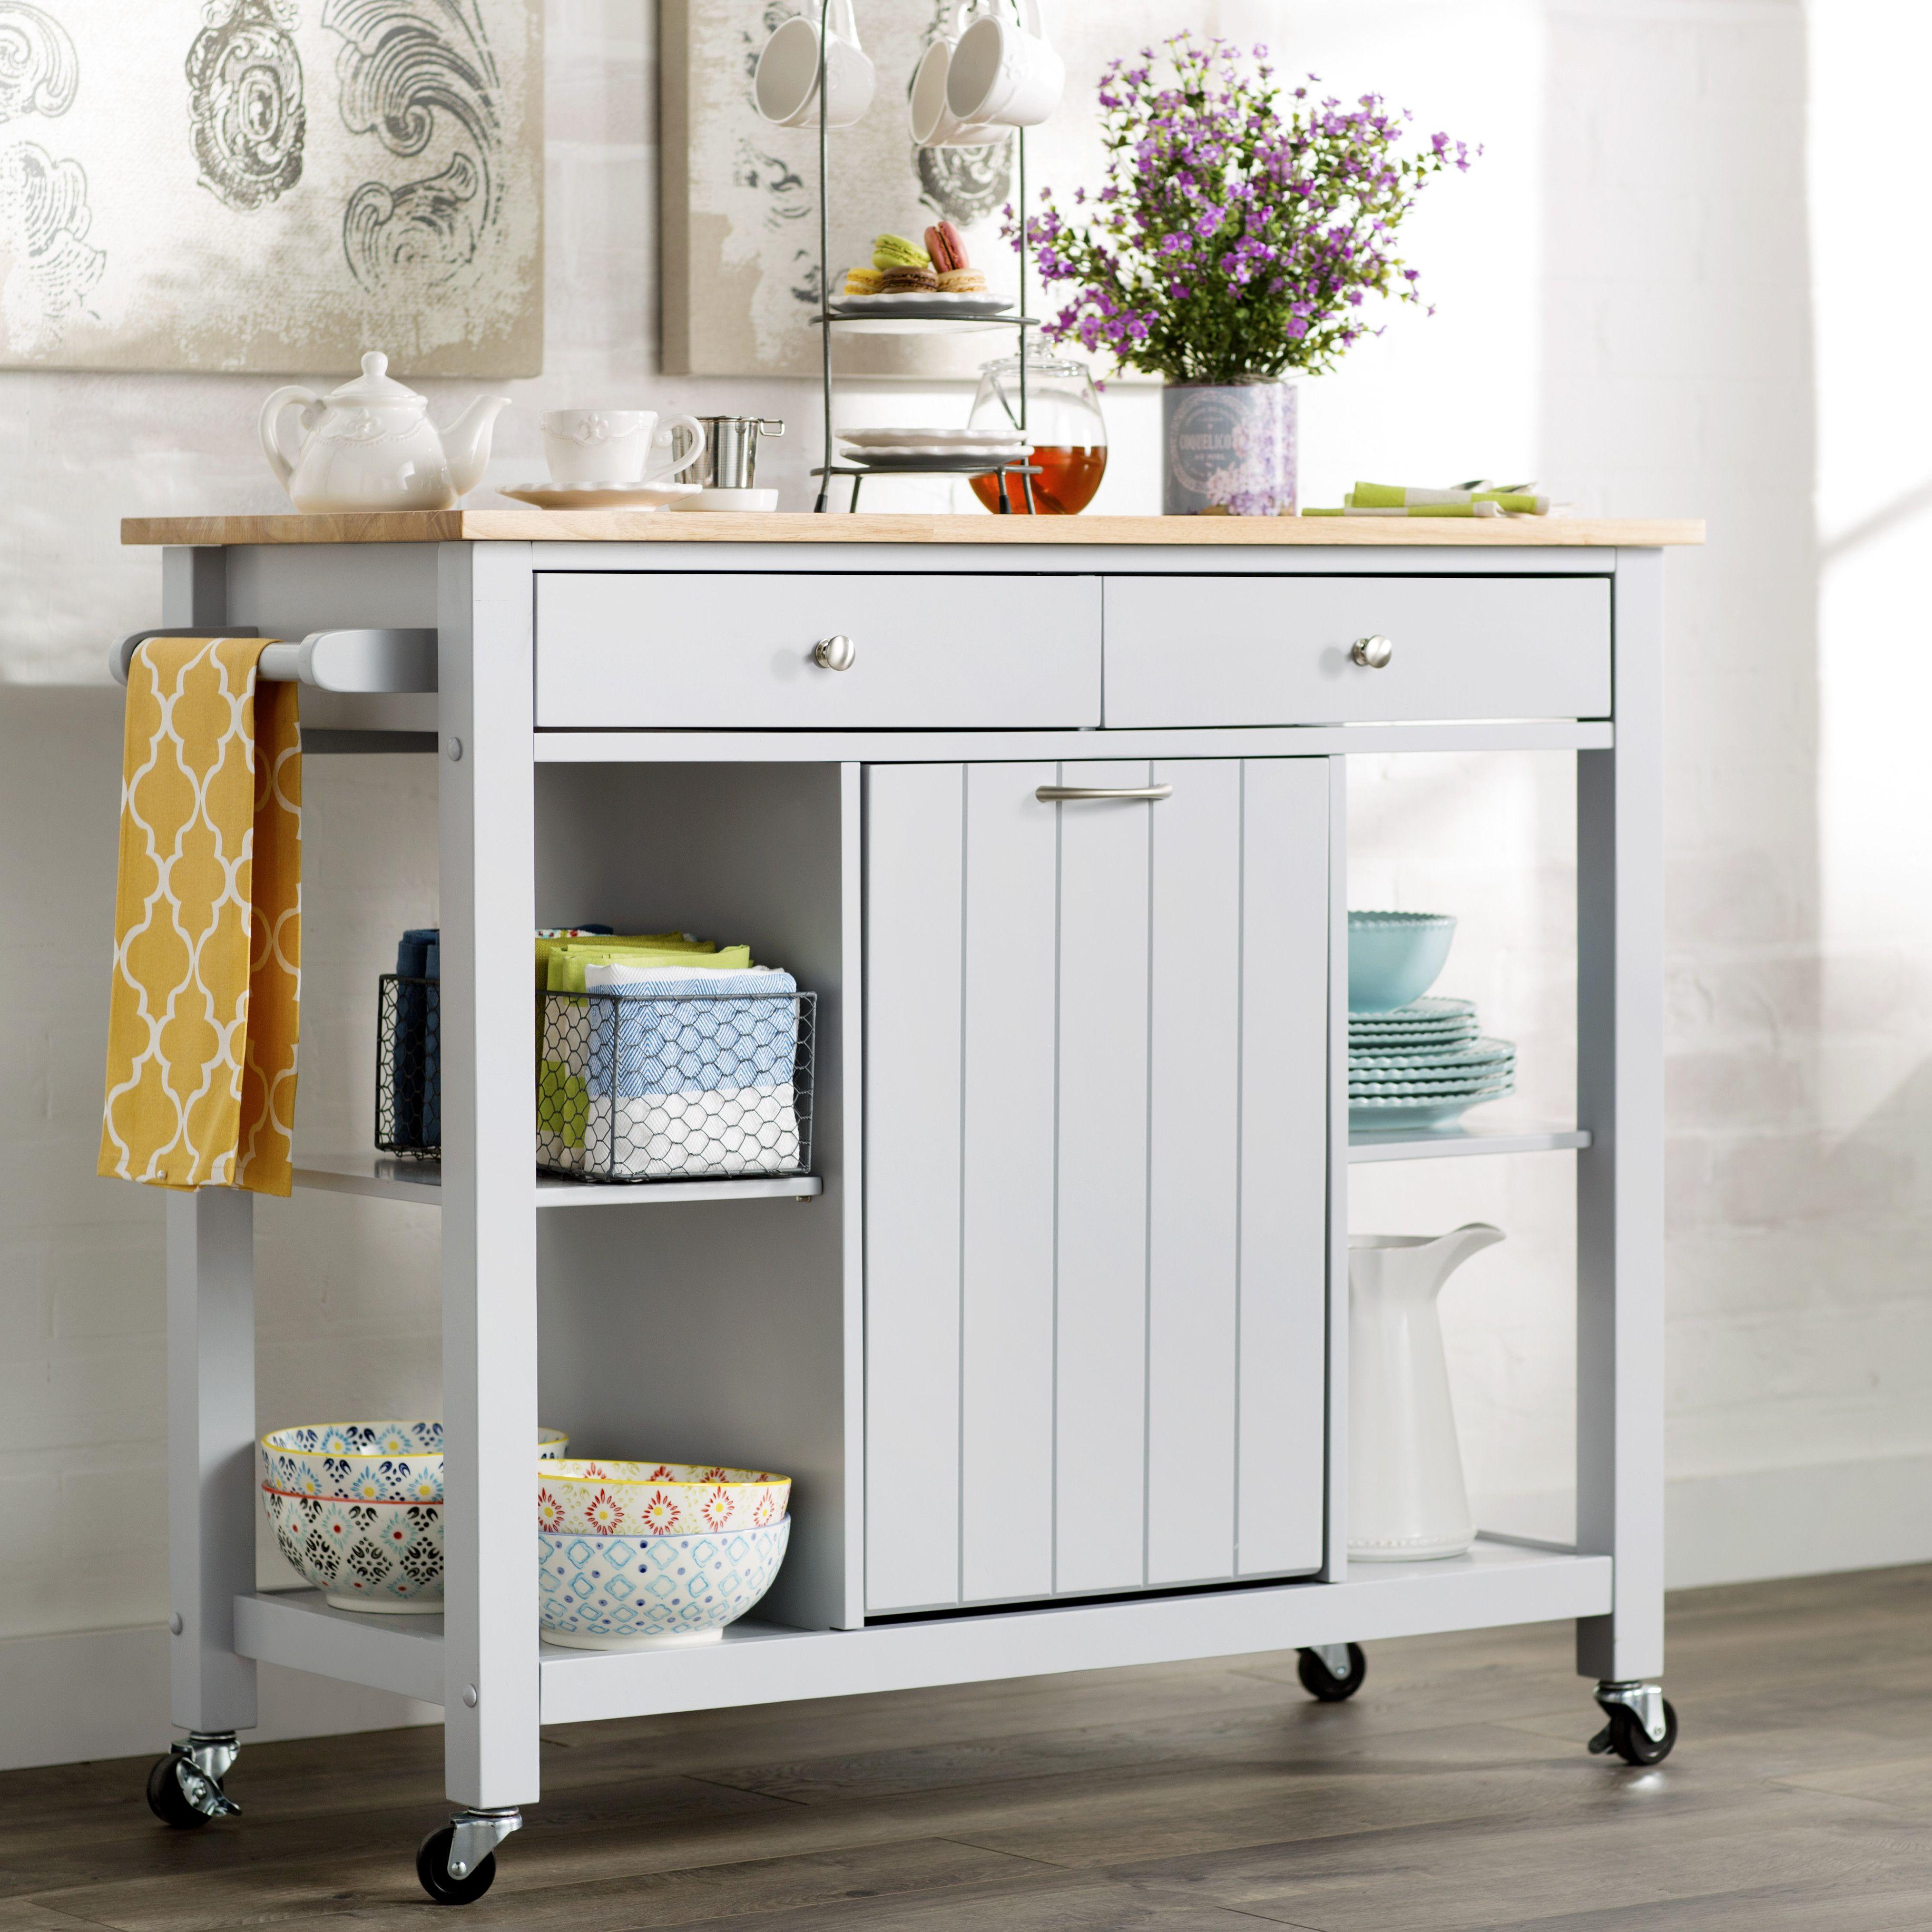 Lark Manor Rodemack Kitchen Cart   Kitchen   Pinterest